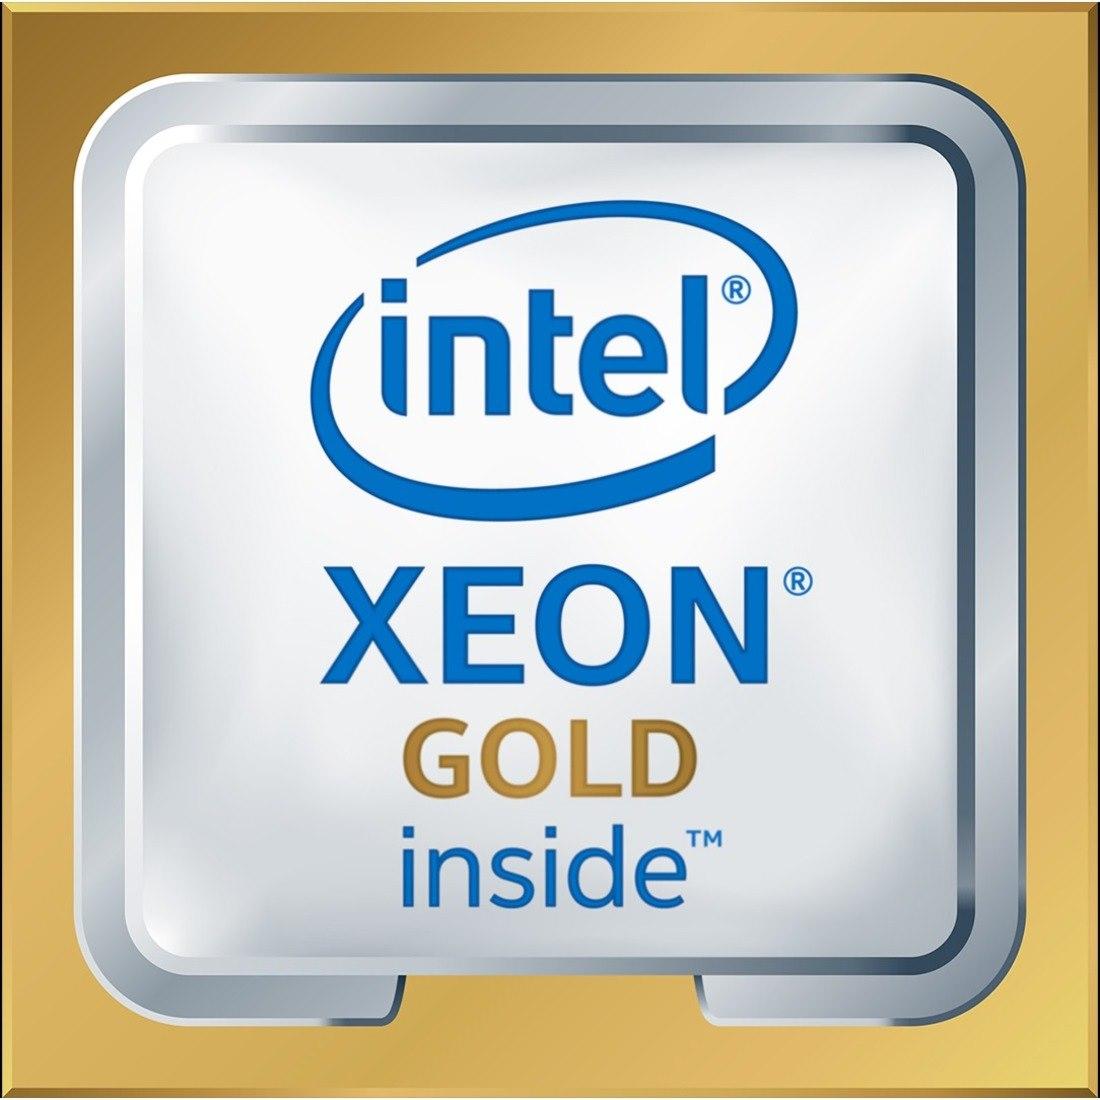 Cisco Intel Xeon 5120 Tetradeca-core (14 Core) 2.20 GHz Processor Upgrade